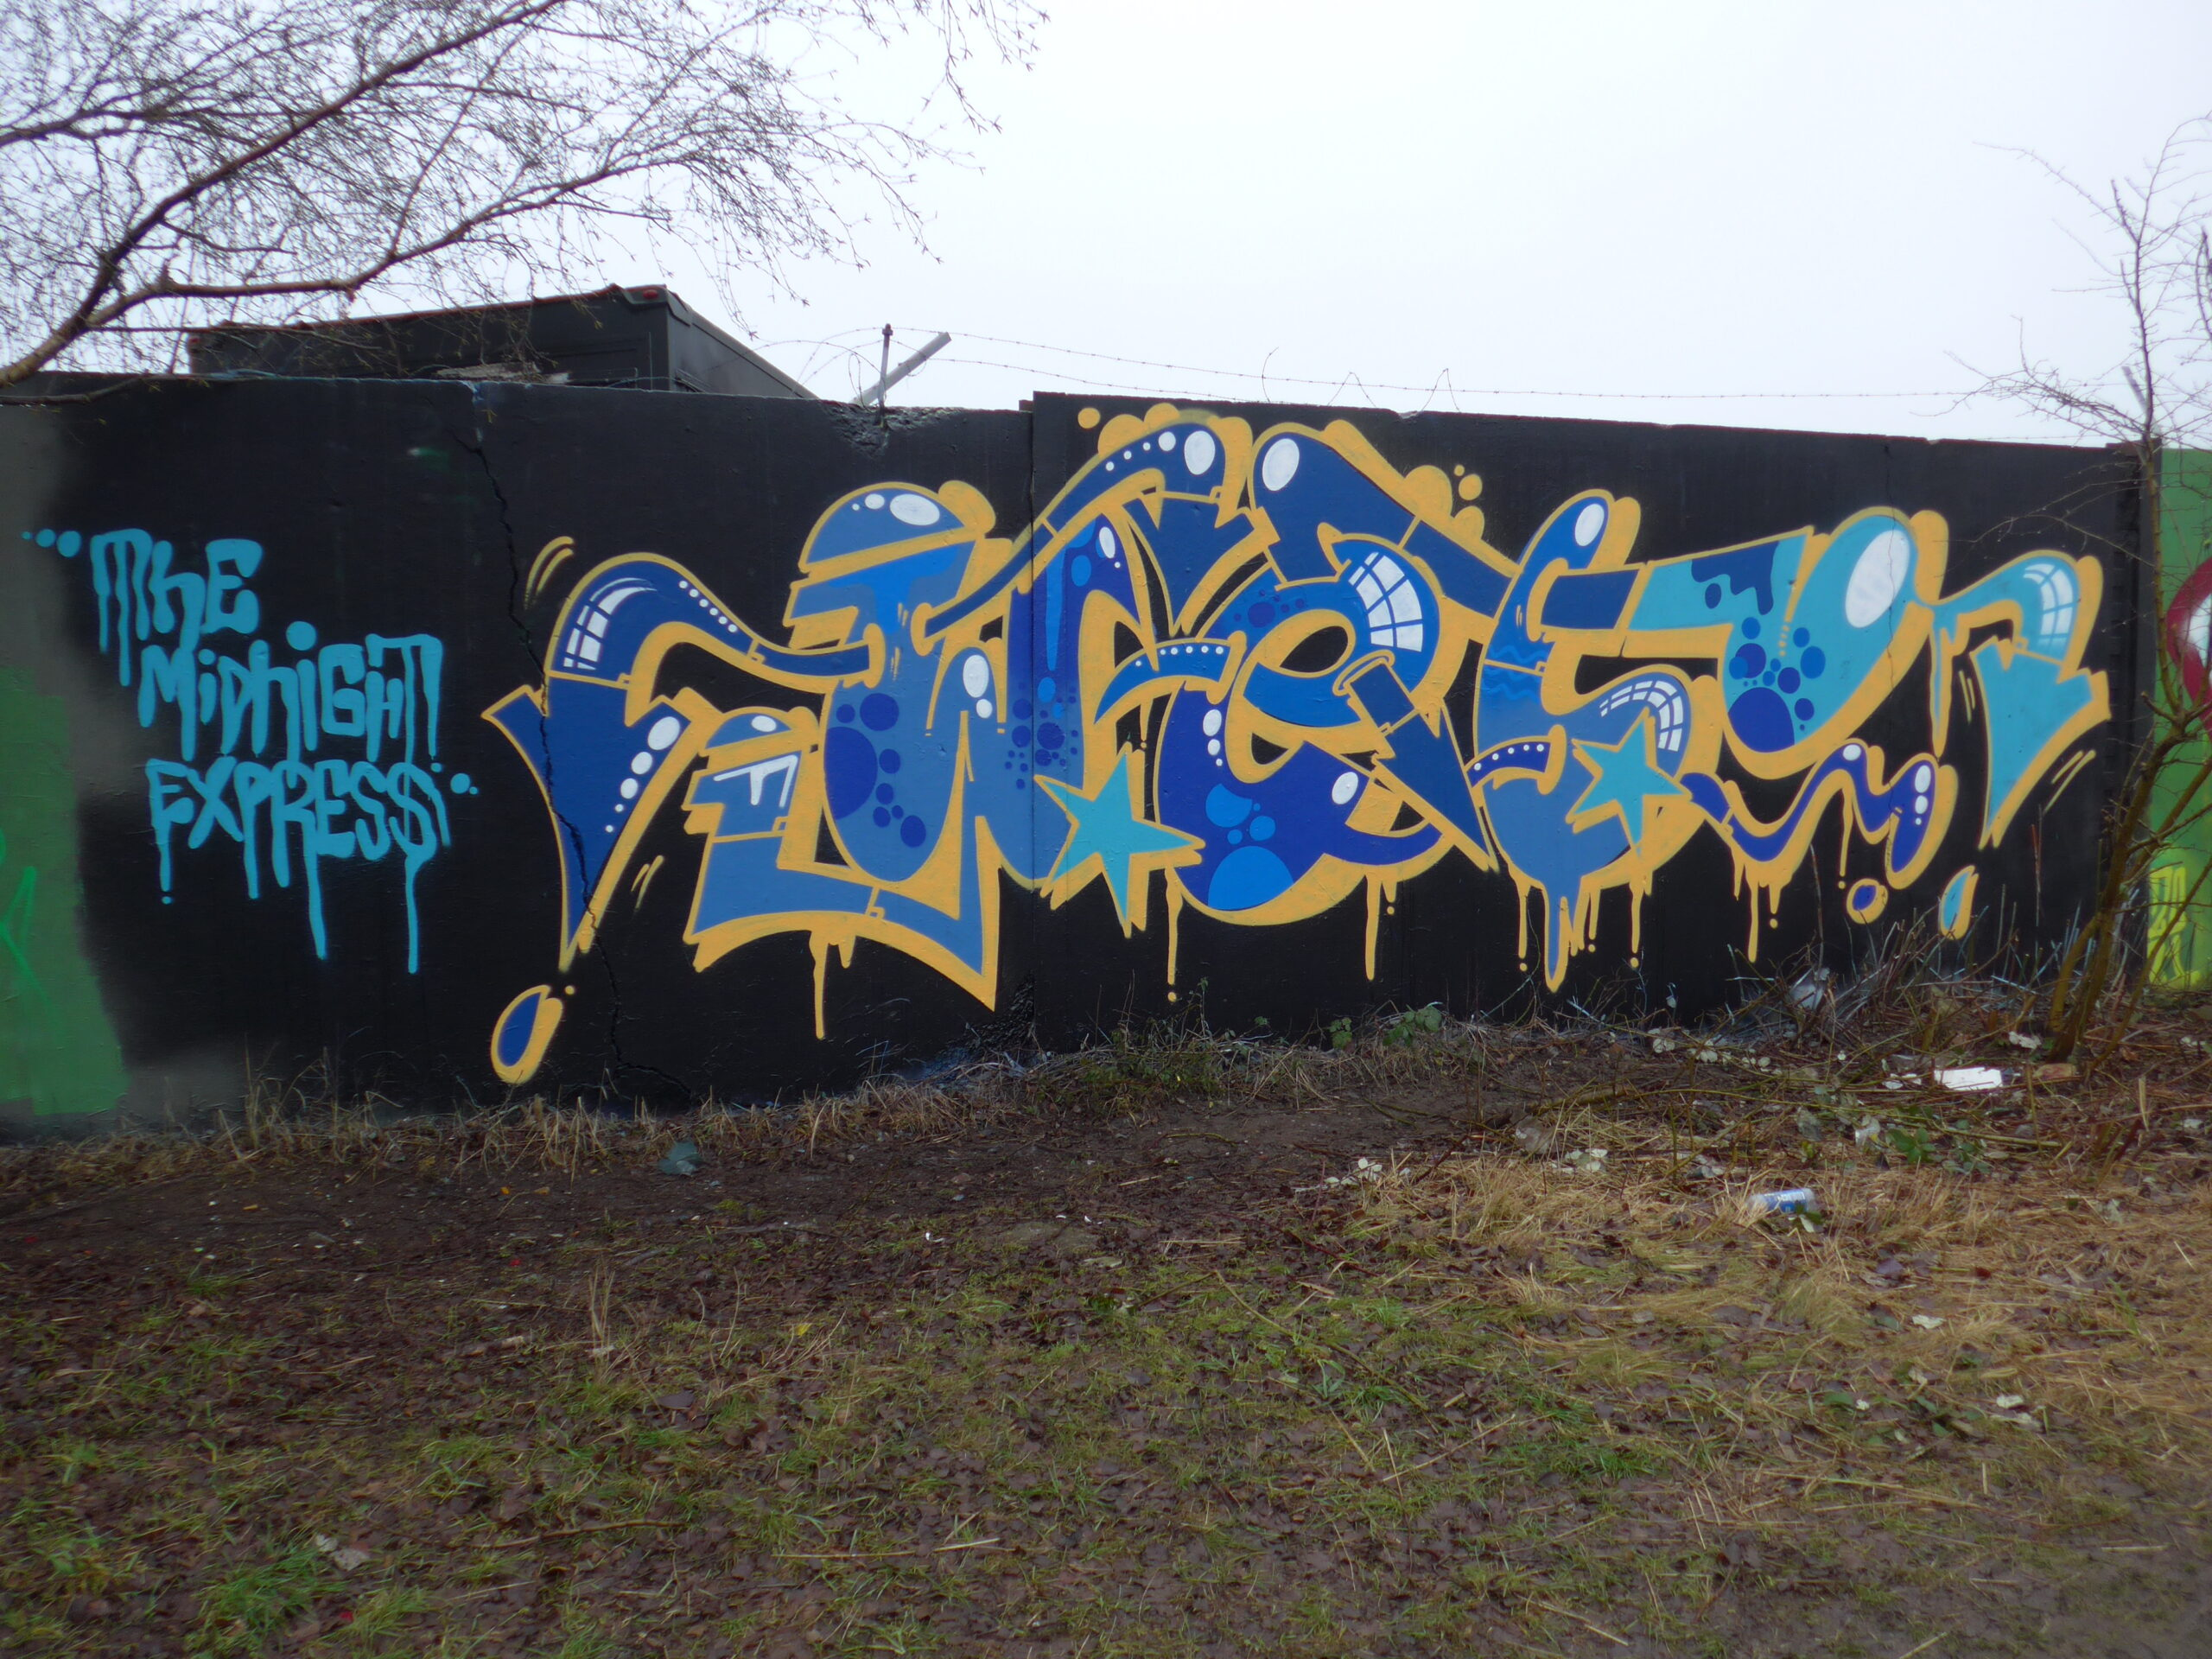 Copenhagen – Graffiti